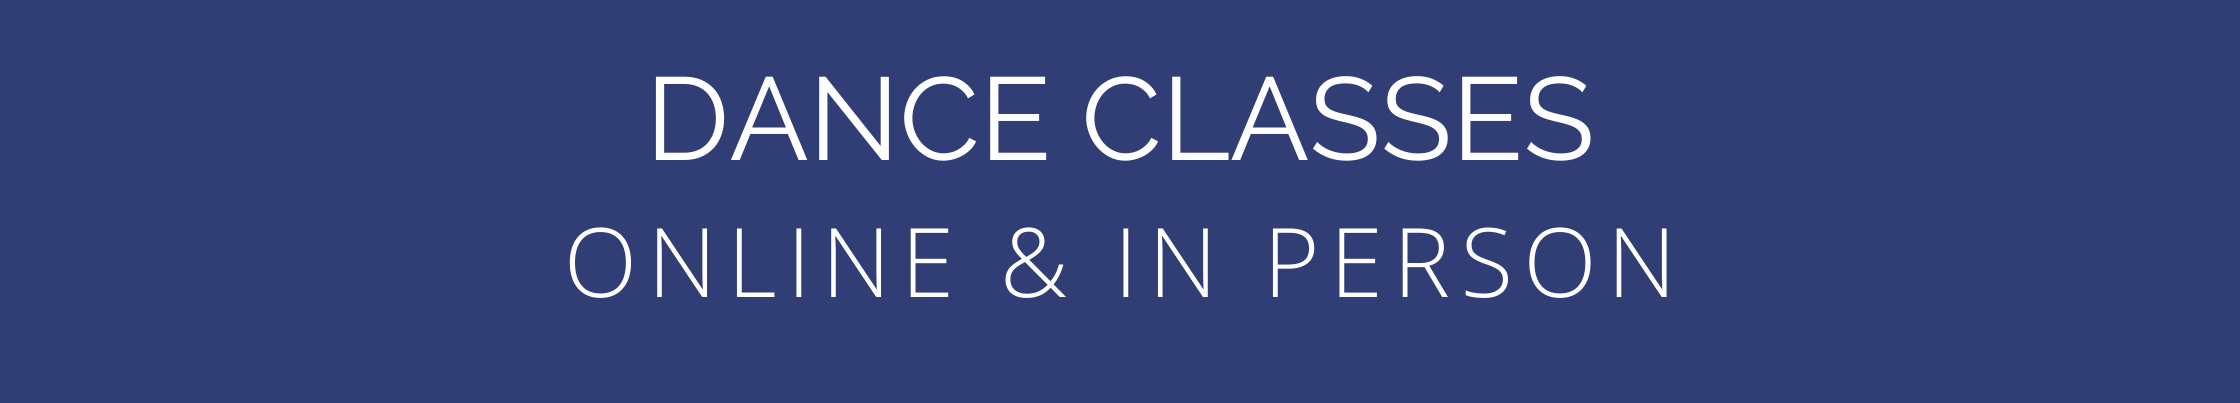 Music Lessons Dance Classes Tucson